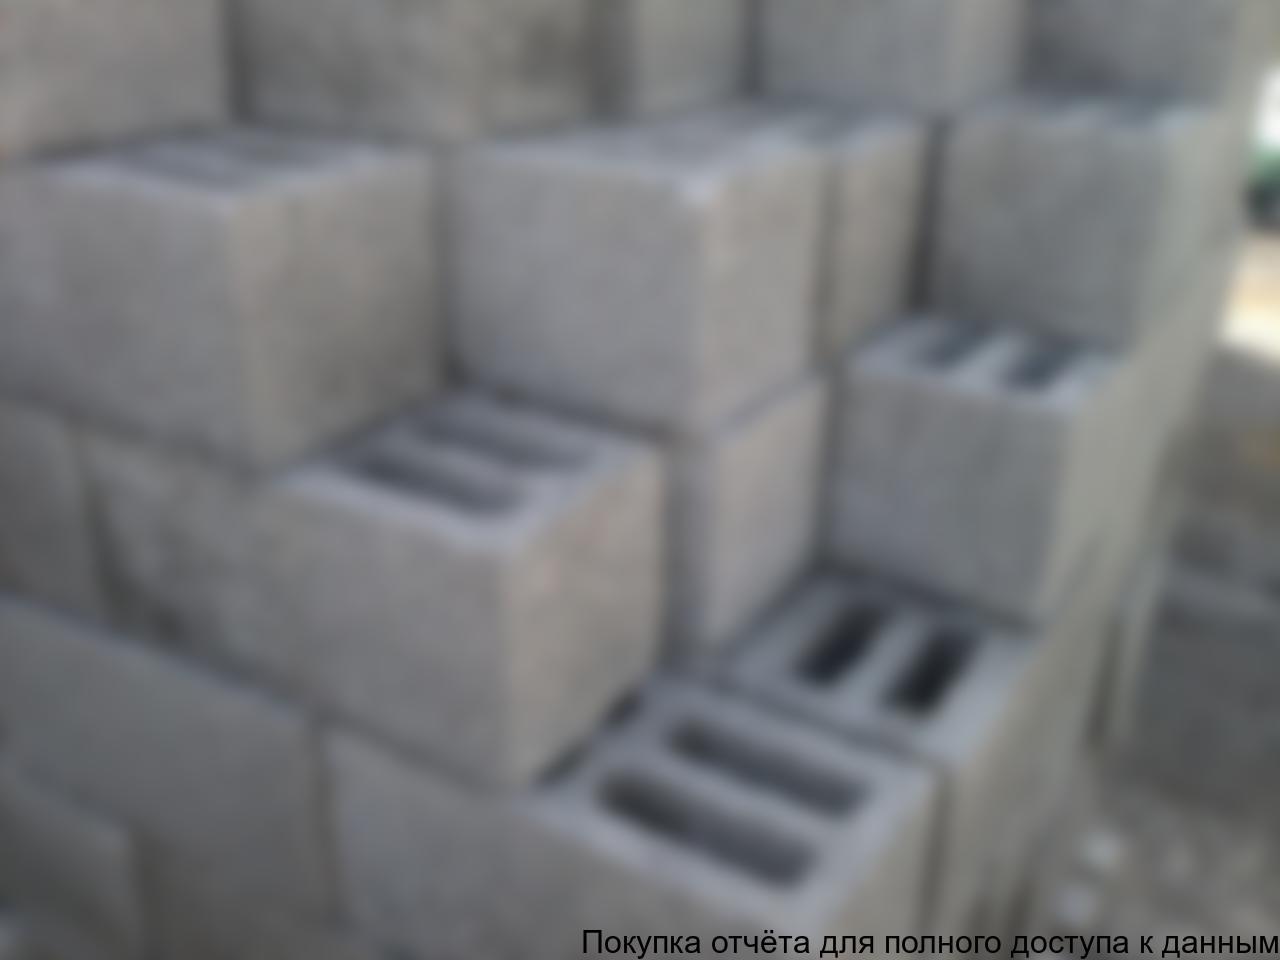 Полусухого прессования бетона бетон купить рузский район